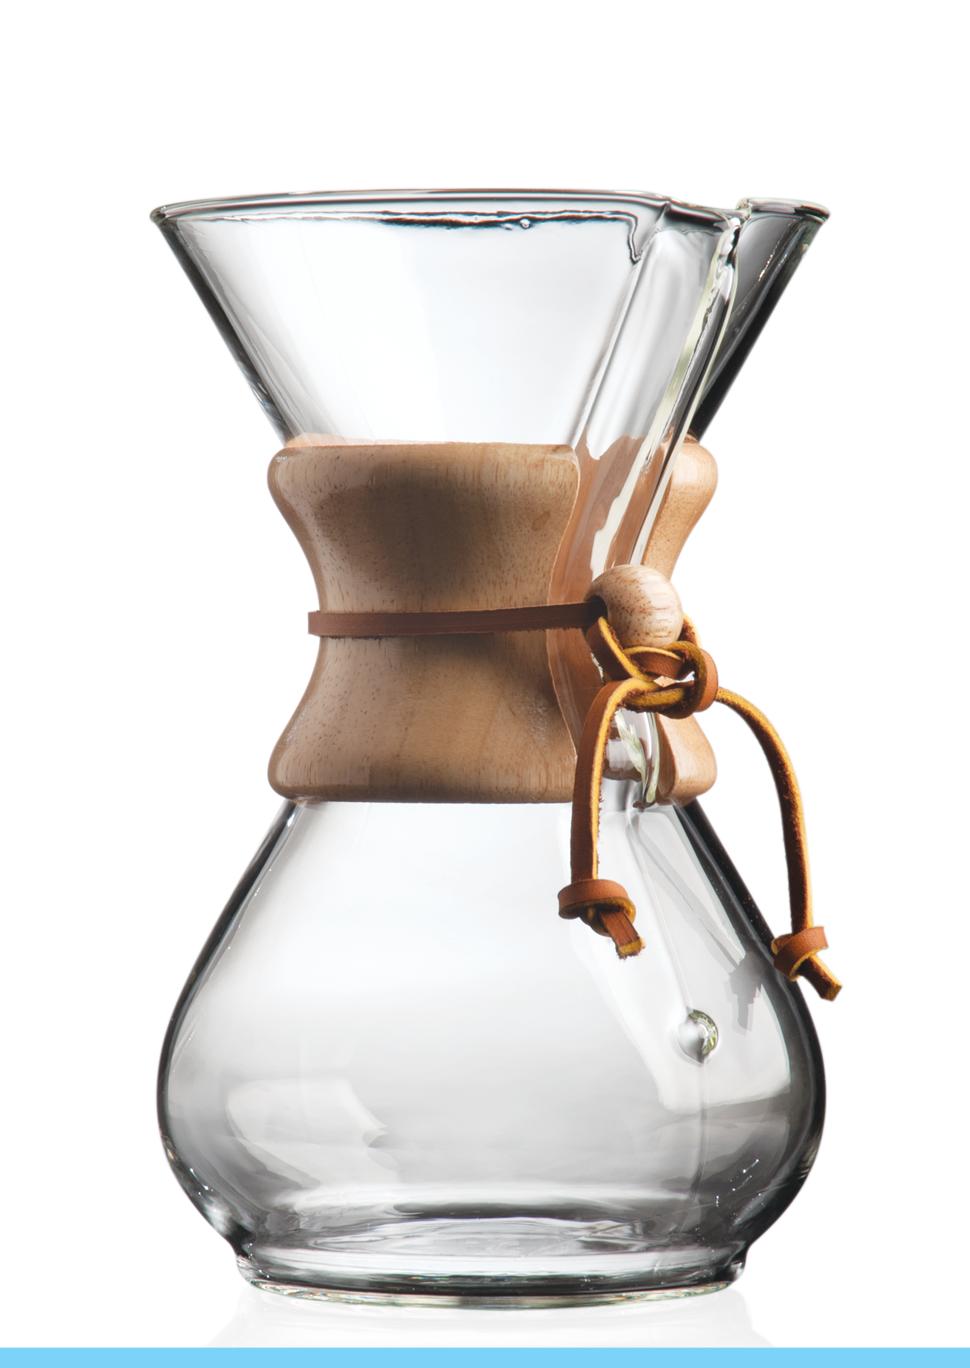 Carolina Coffee Chemex® 6-Cup Coffeemaker With Wood Collar and Tie